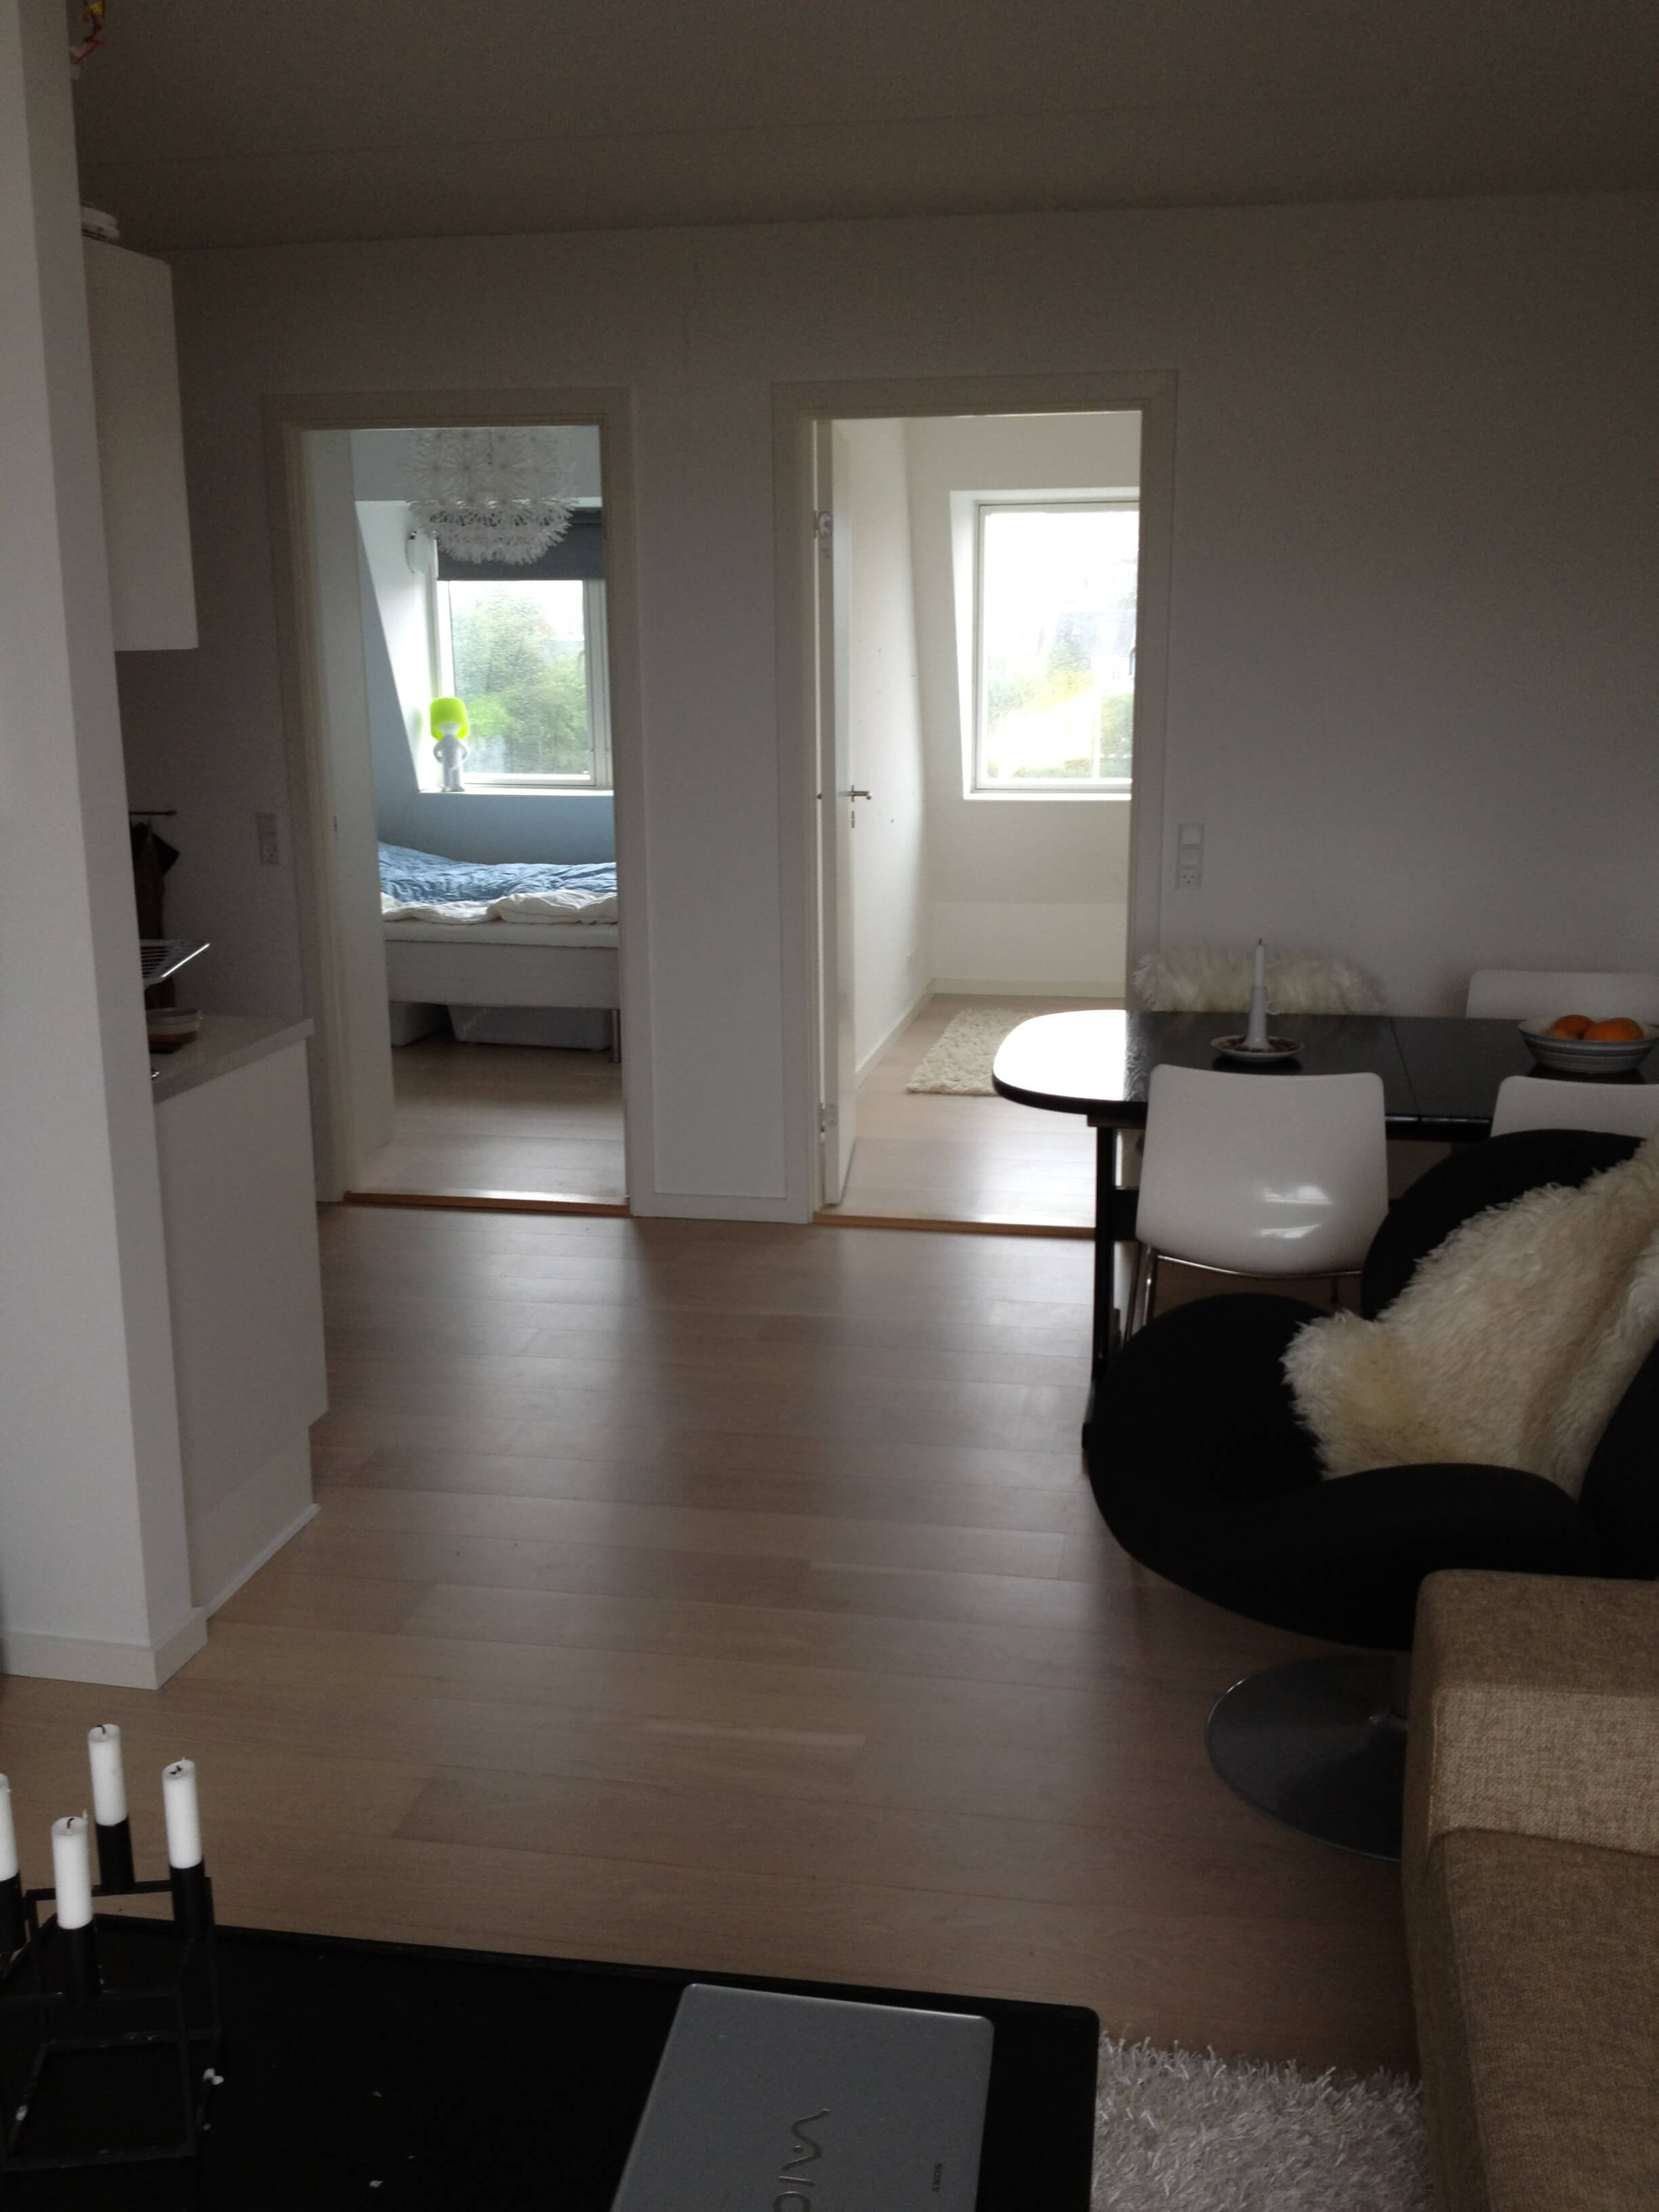 Oslogade 3, stue1